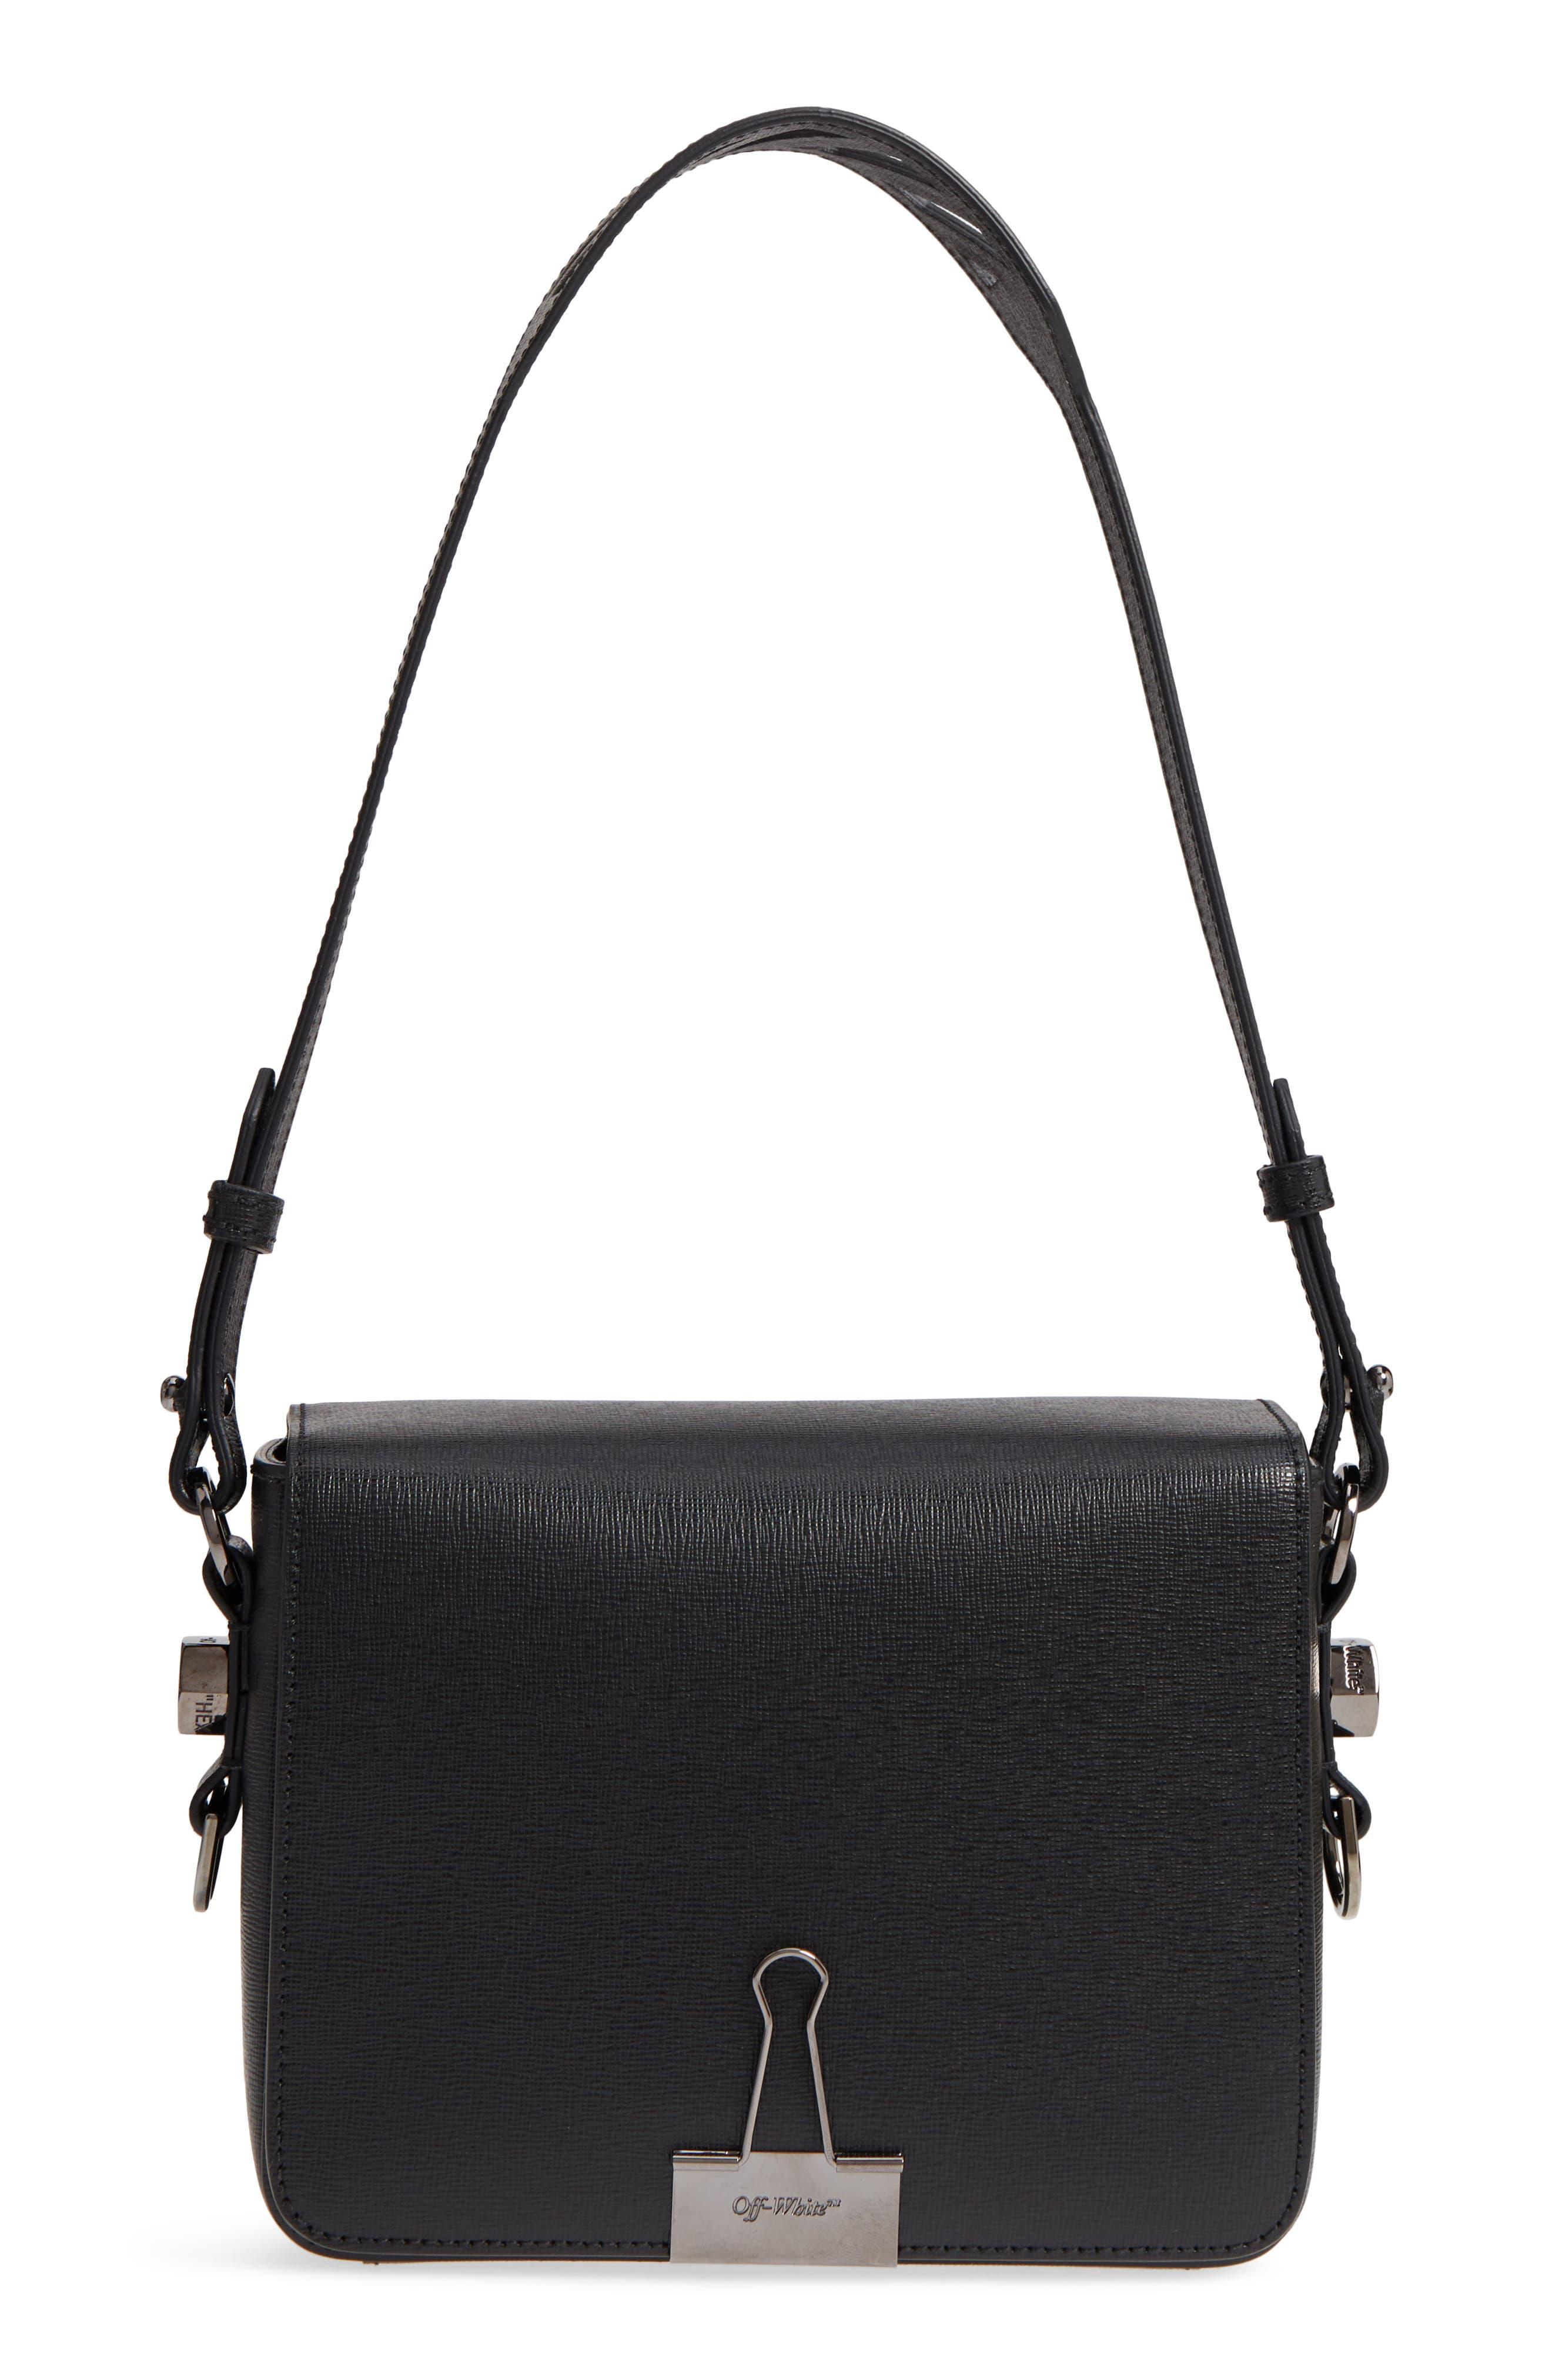 Binder Clip Leather Flap Bag,                             Alternate thumbnail 3, color,                             Black